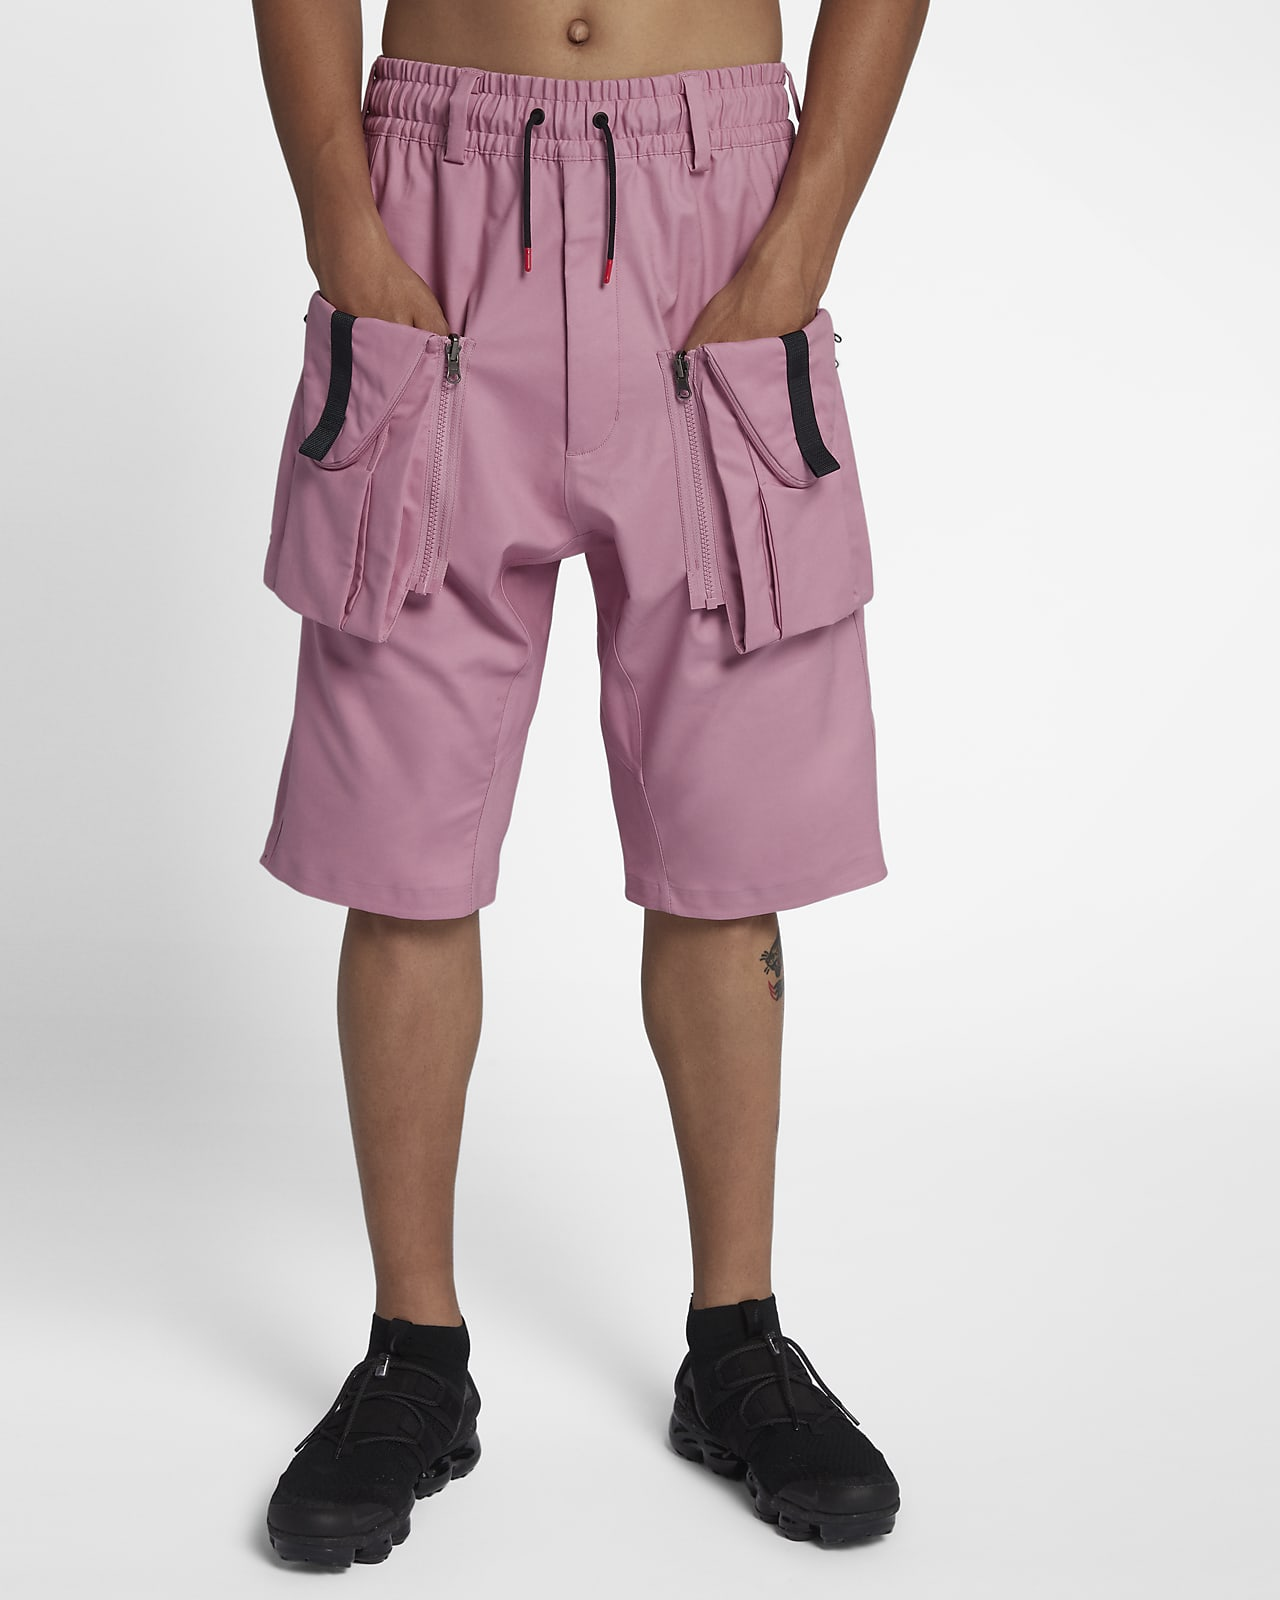 NikeLab ACG Deploy Men's Cargo Shorts